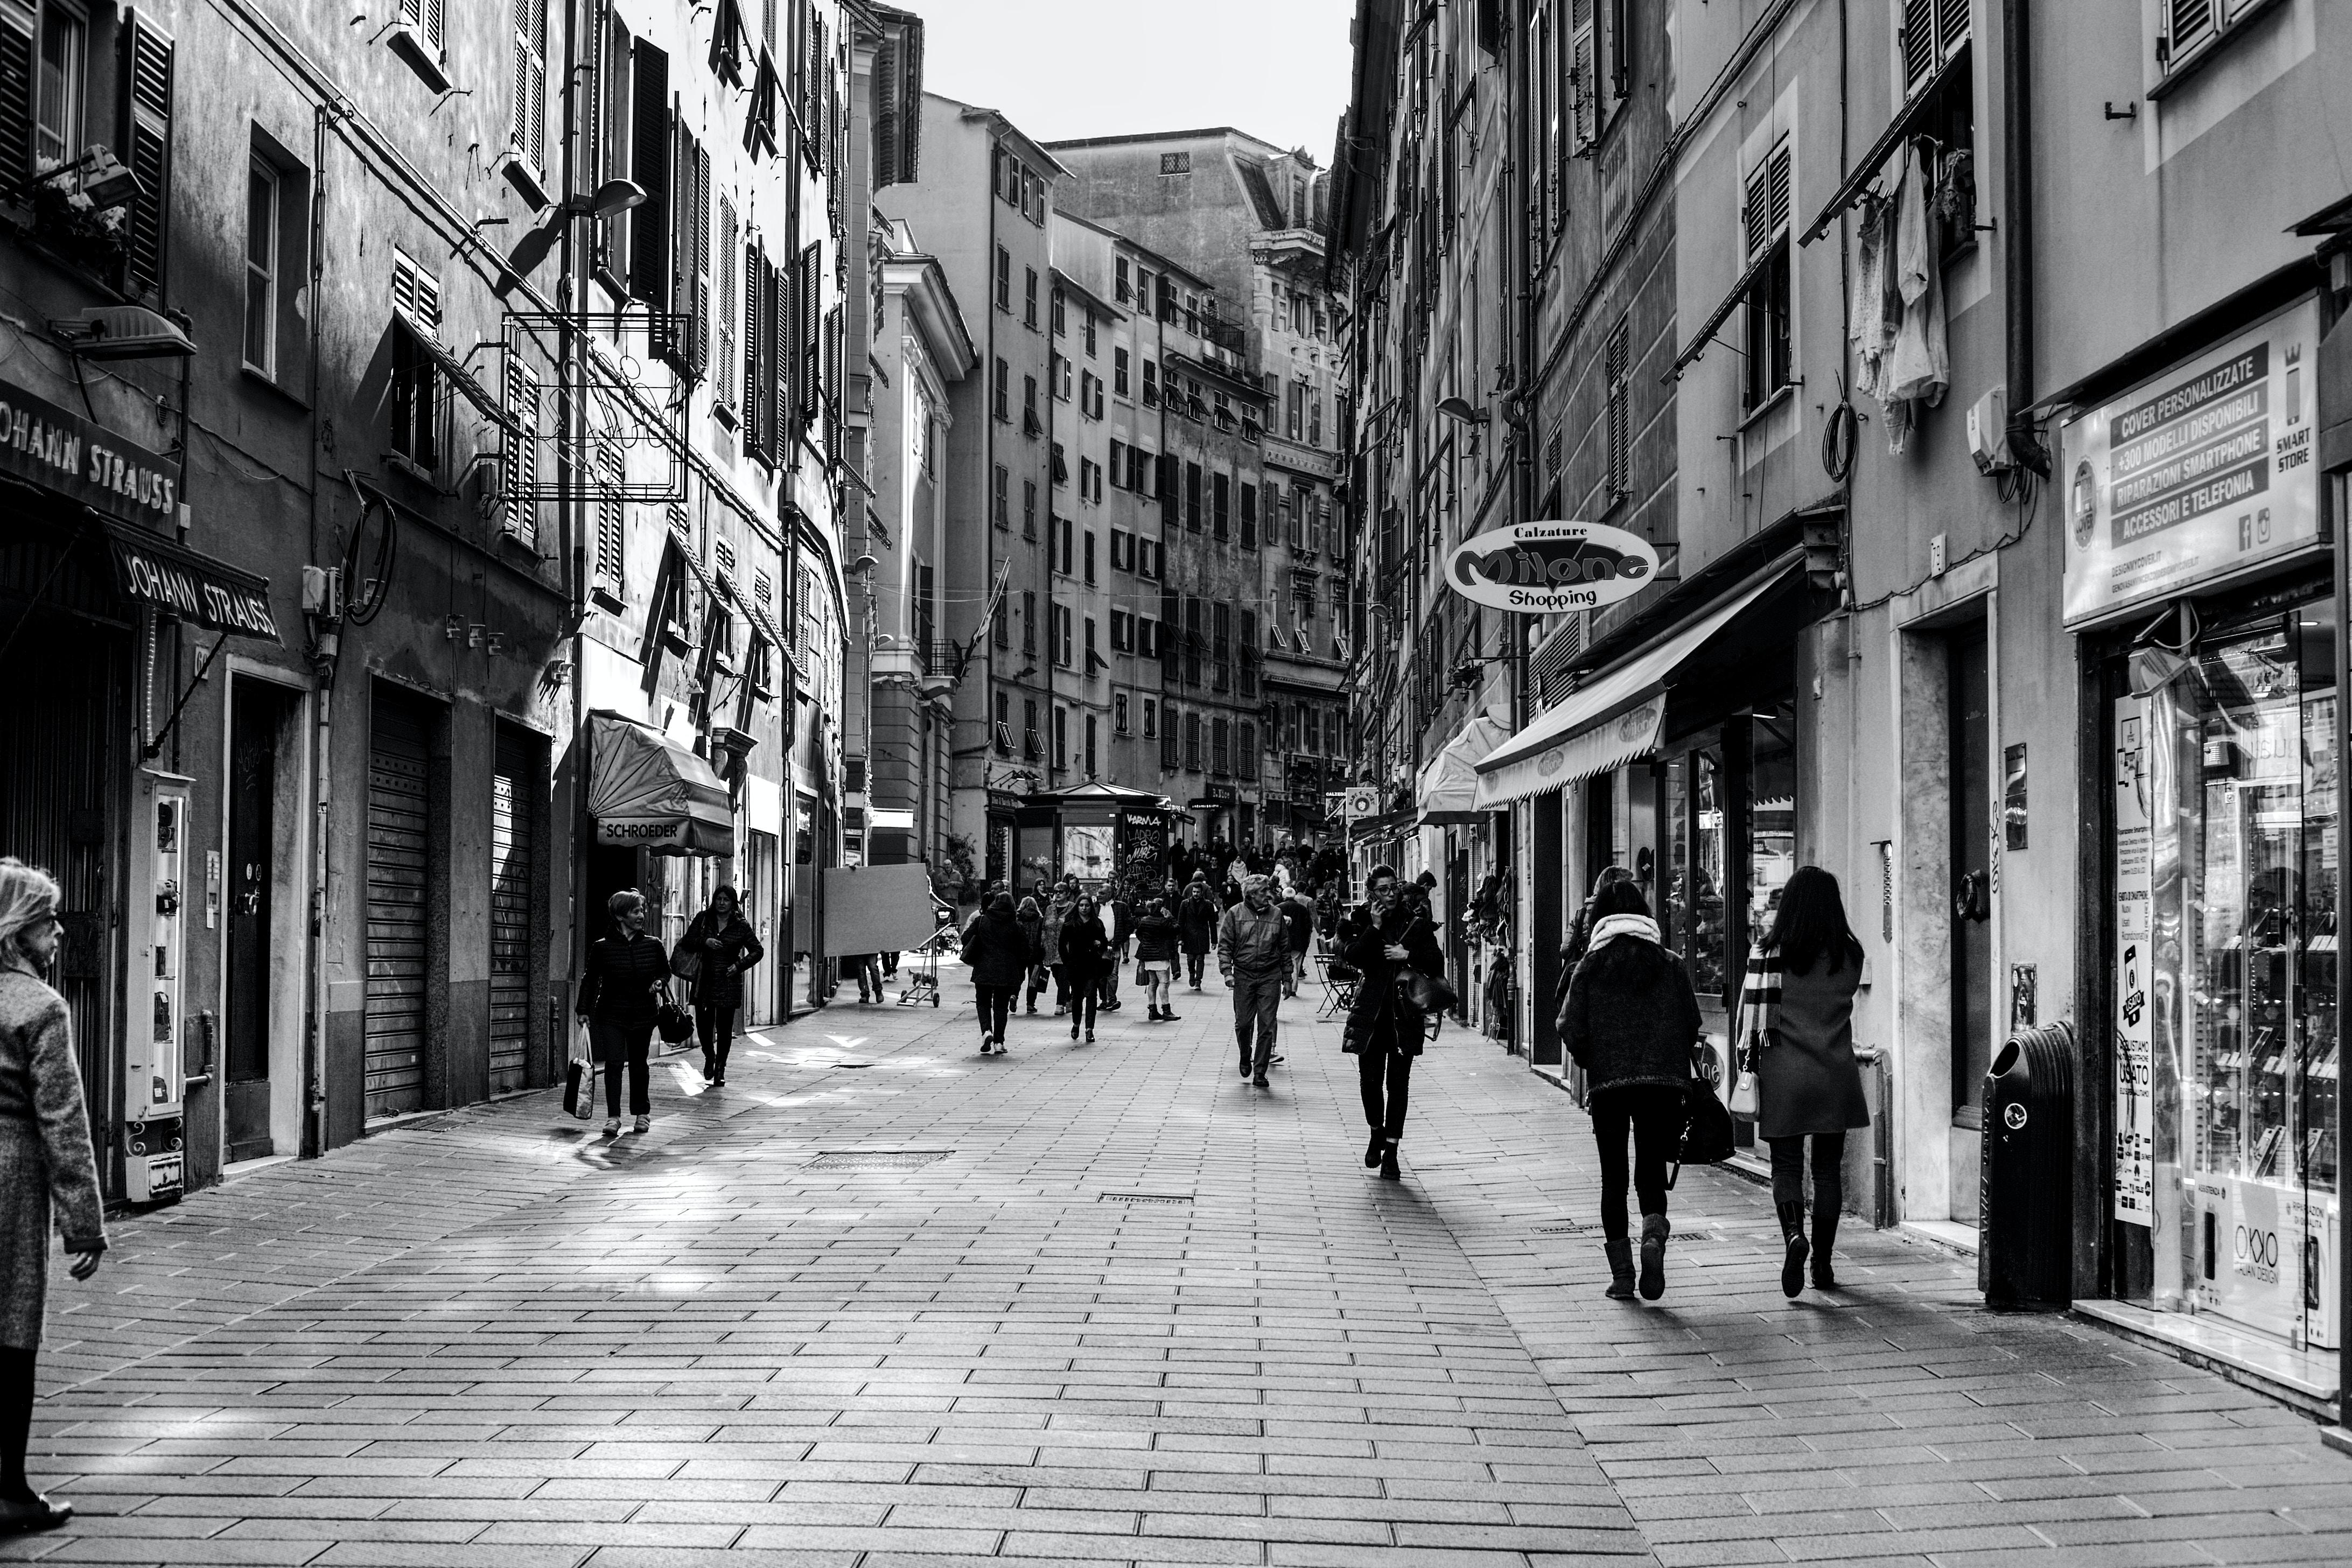 grayscale photo of people walking between buildings during daytime